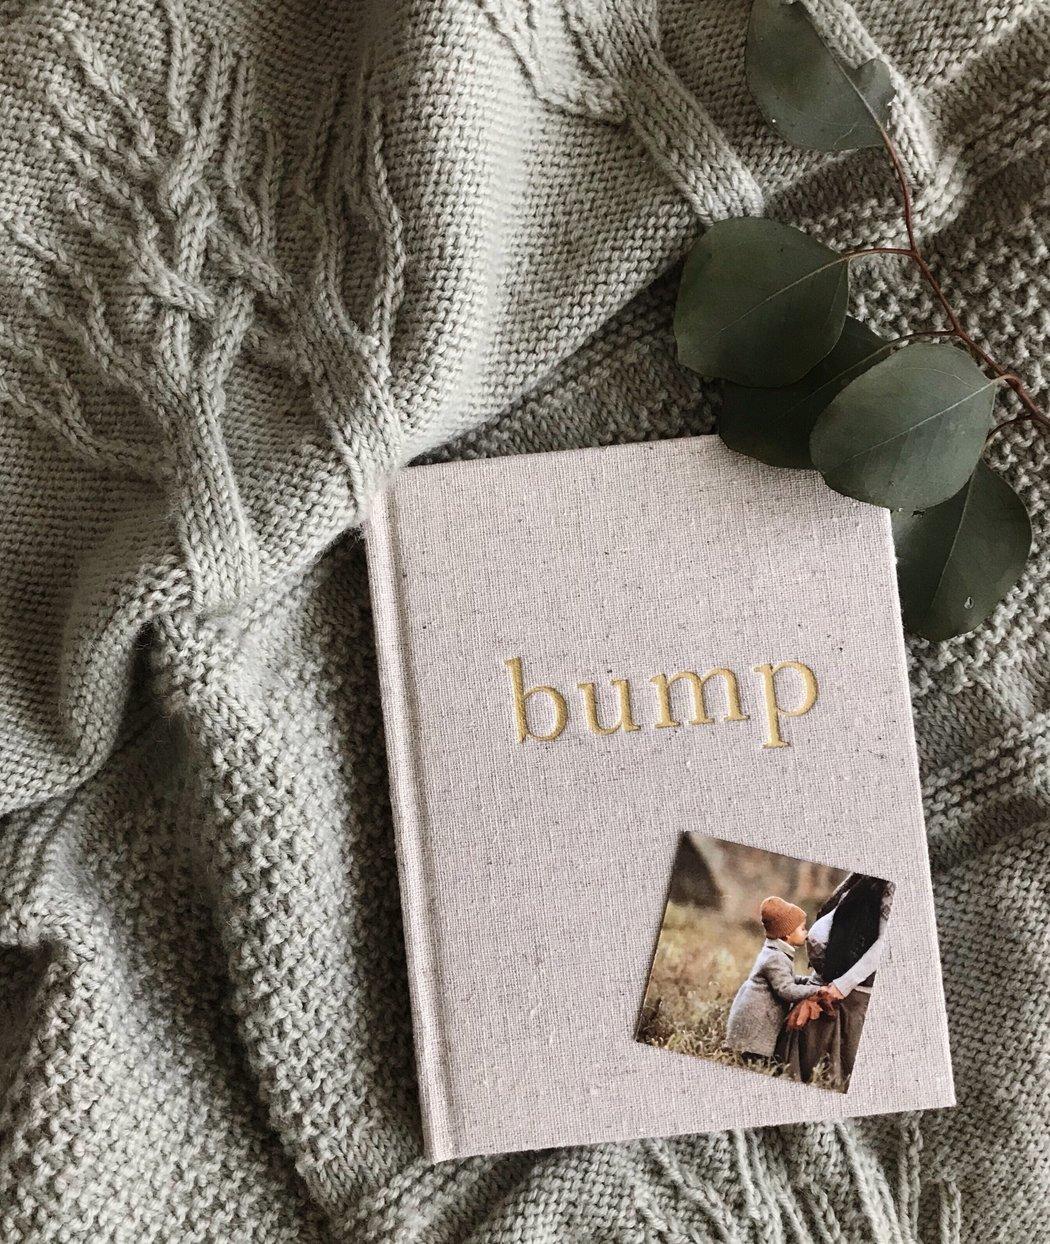 Write to Me - Bump A Pregnancy Story